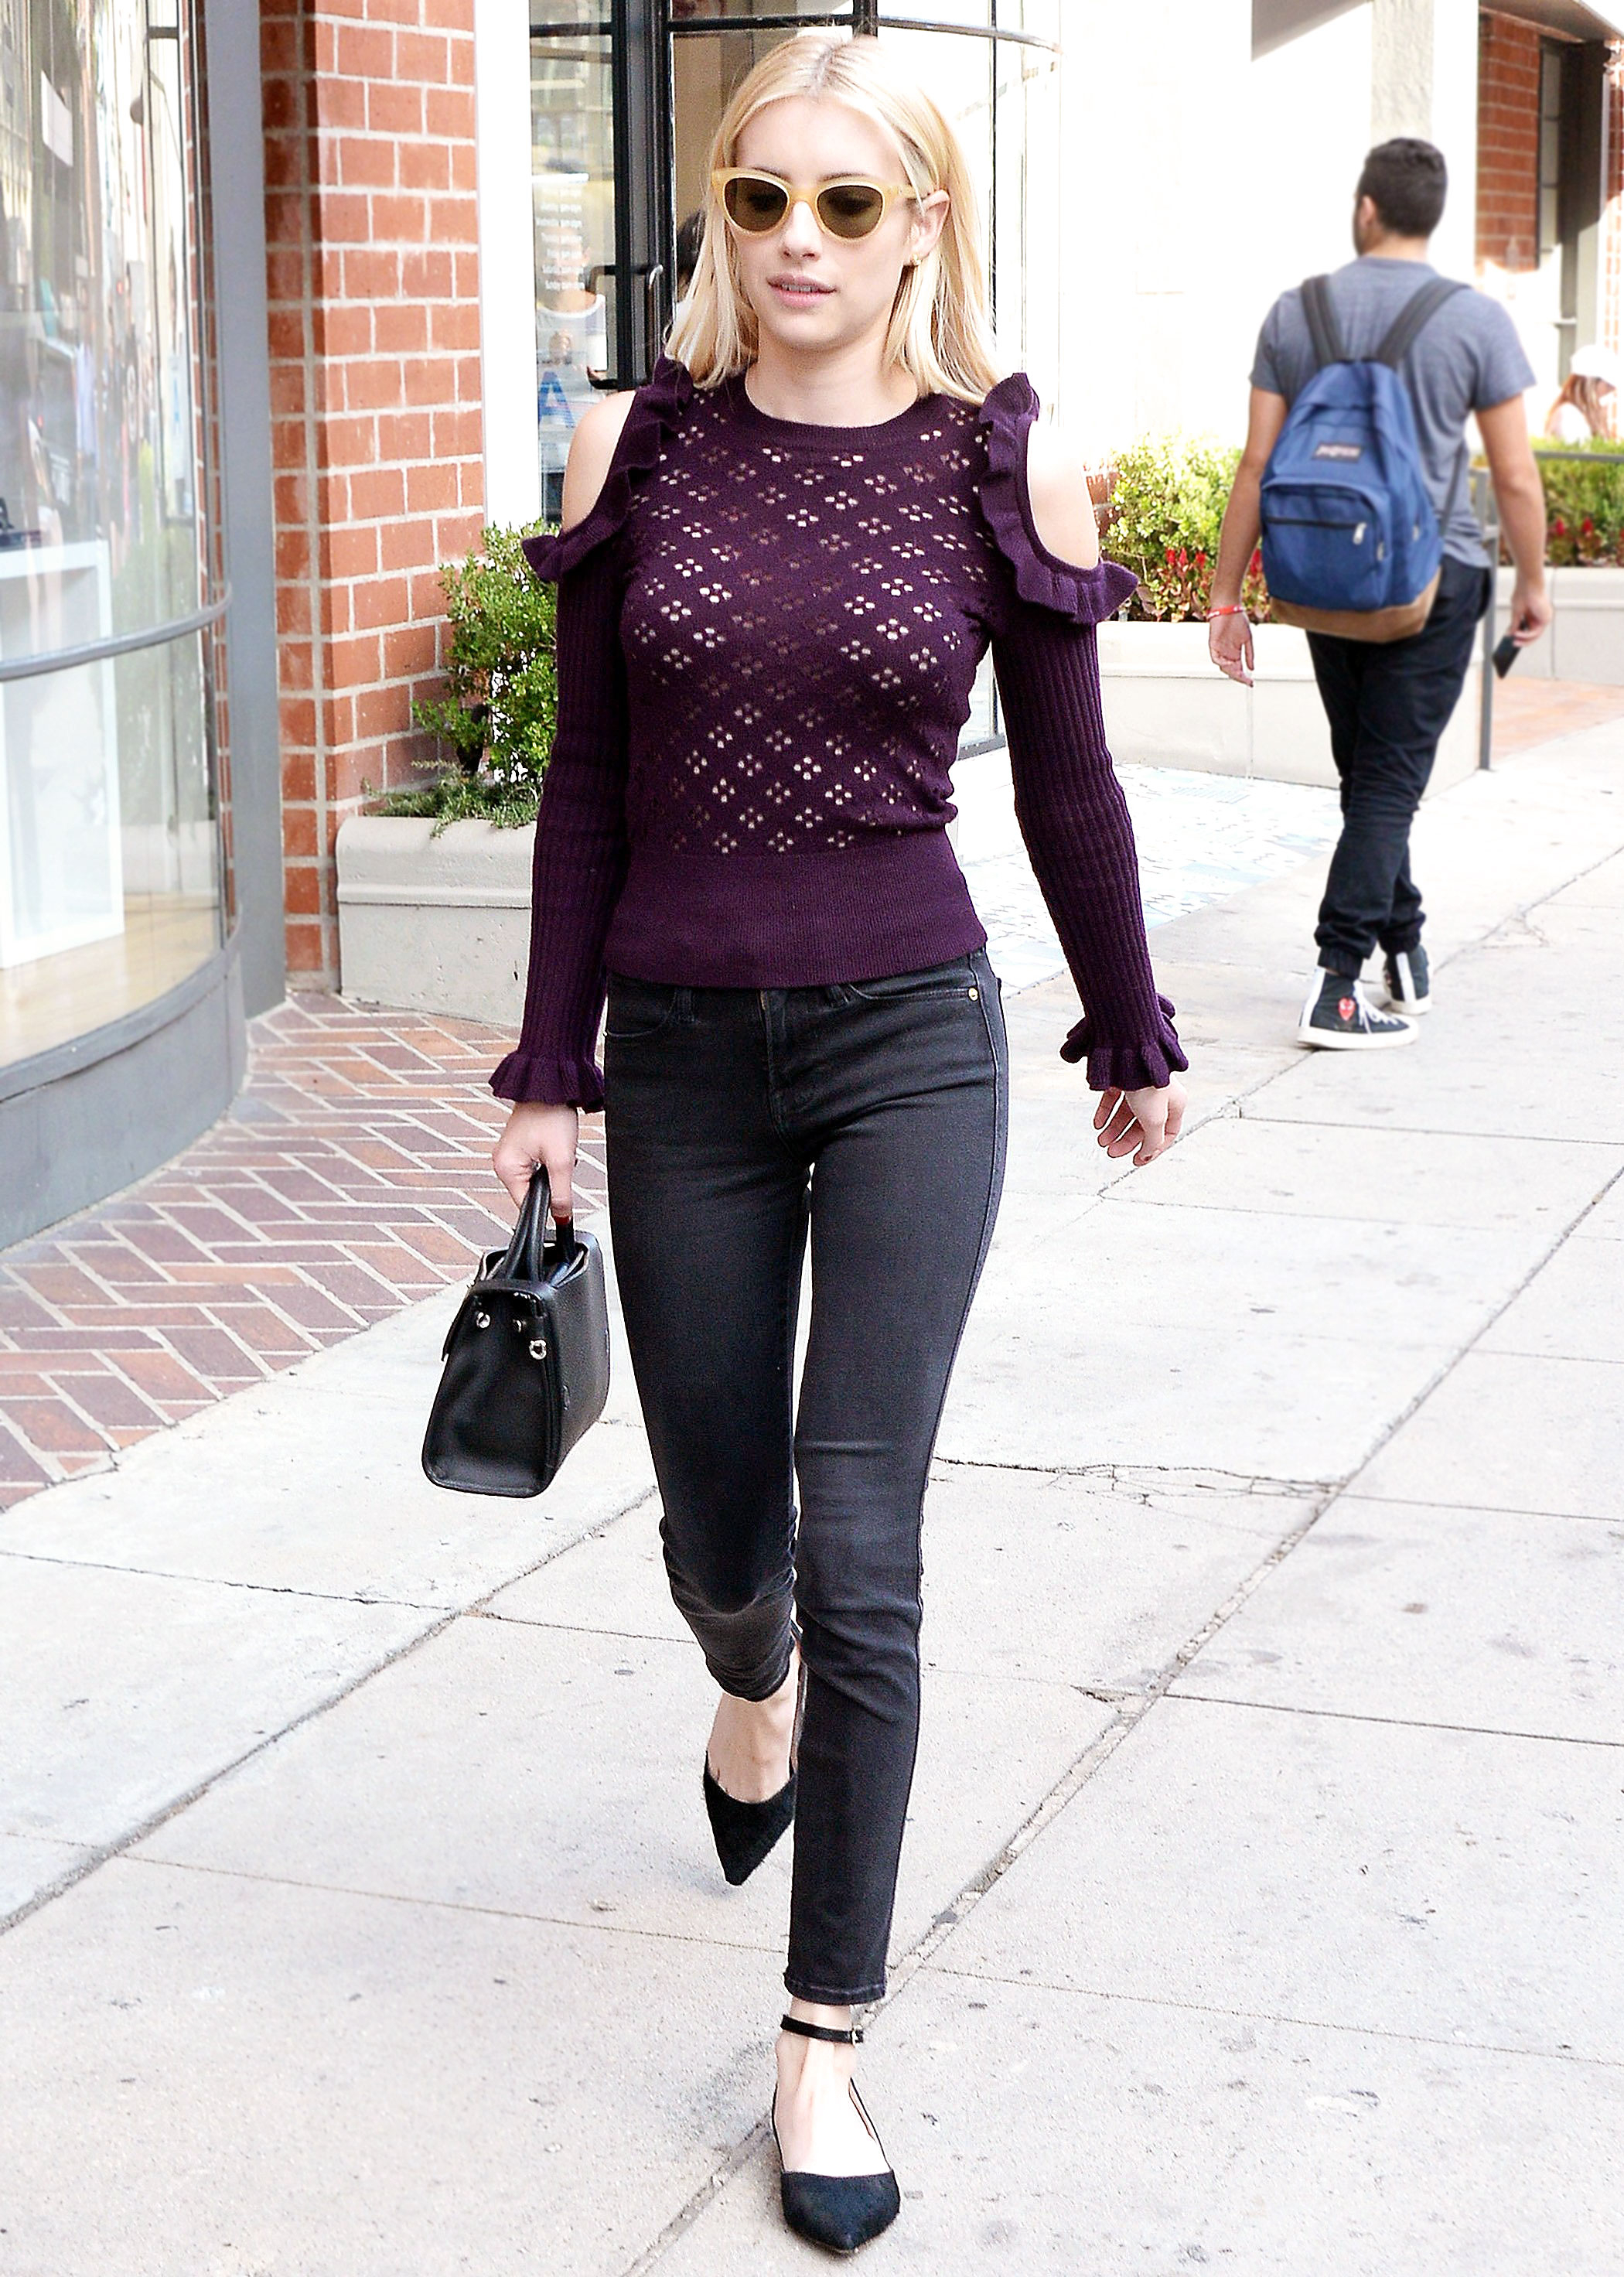 Shop Emma Roberts' Purple Cold-Shoulder Sweater